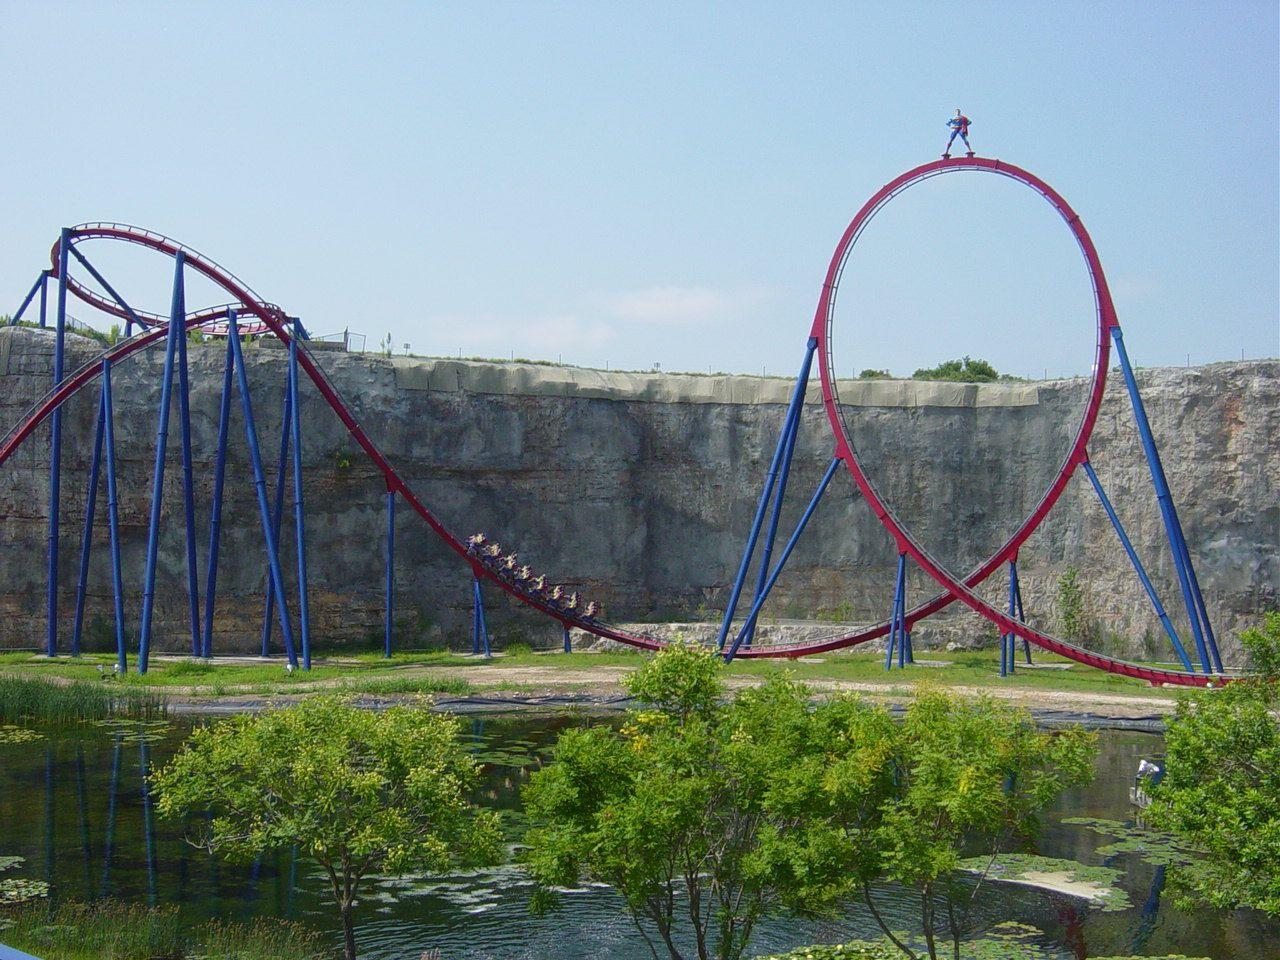 Giant Loop On Superman Krypton Coaster At Six Flags Fiesta Texas San Antonio Cleverly Built Into The Side Thrill Ride Six Flags Fiesta Texas Roller Coaster